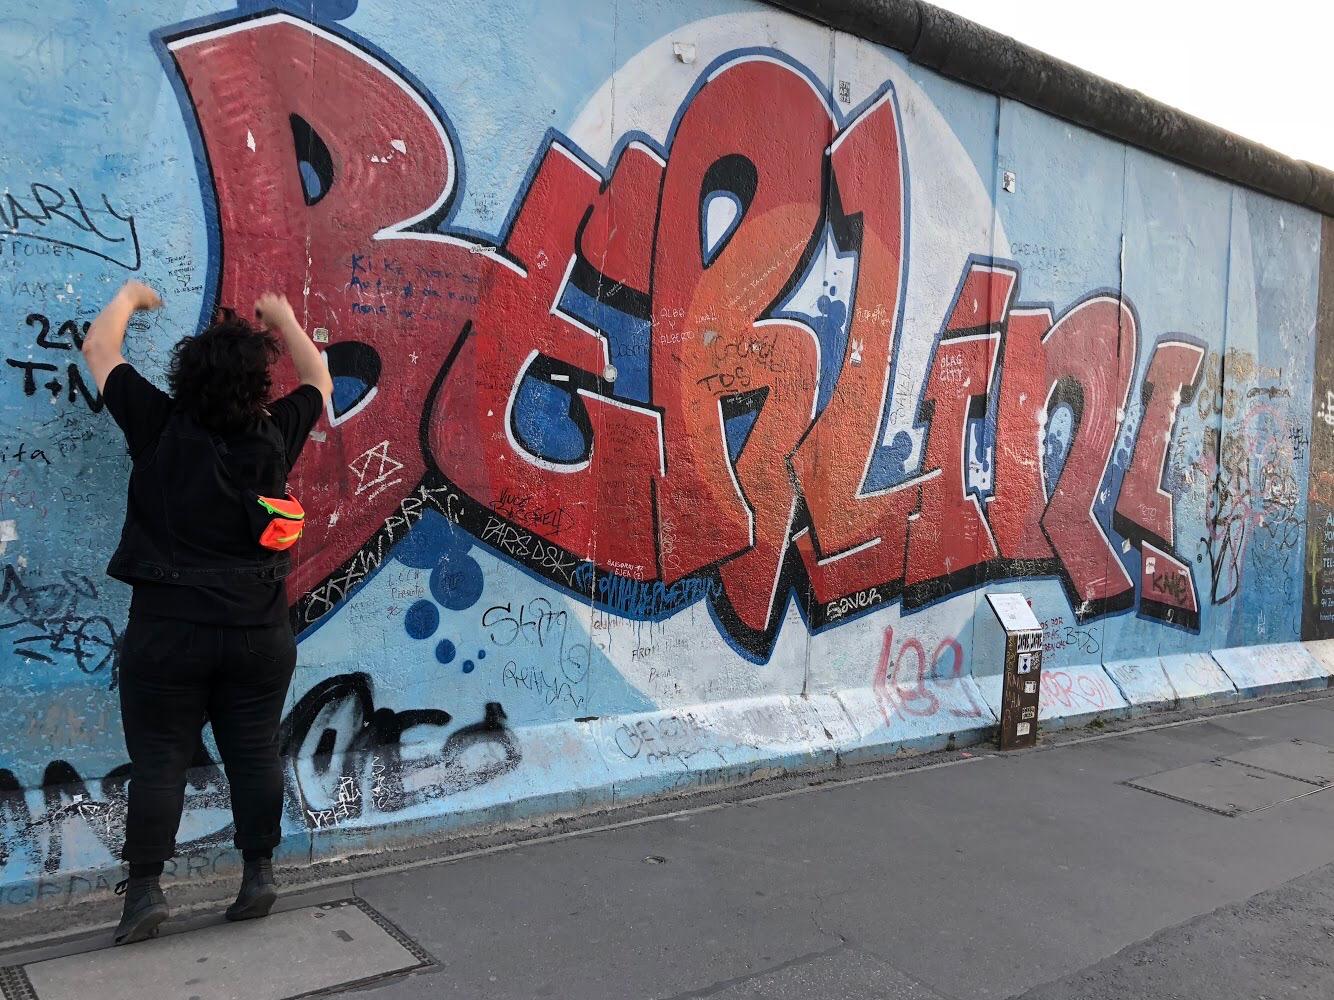 TRAVELED EUROPE! - Berlin! London! Paris! Oh MY!